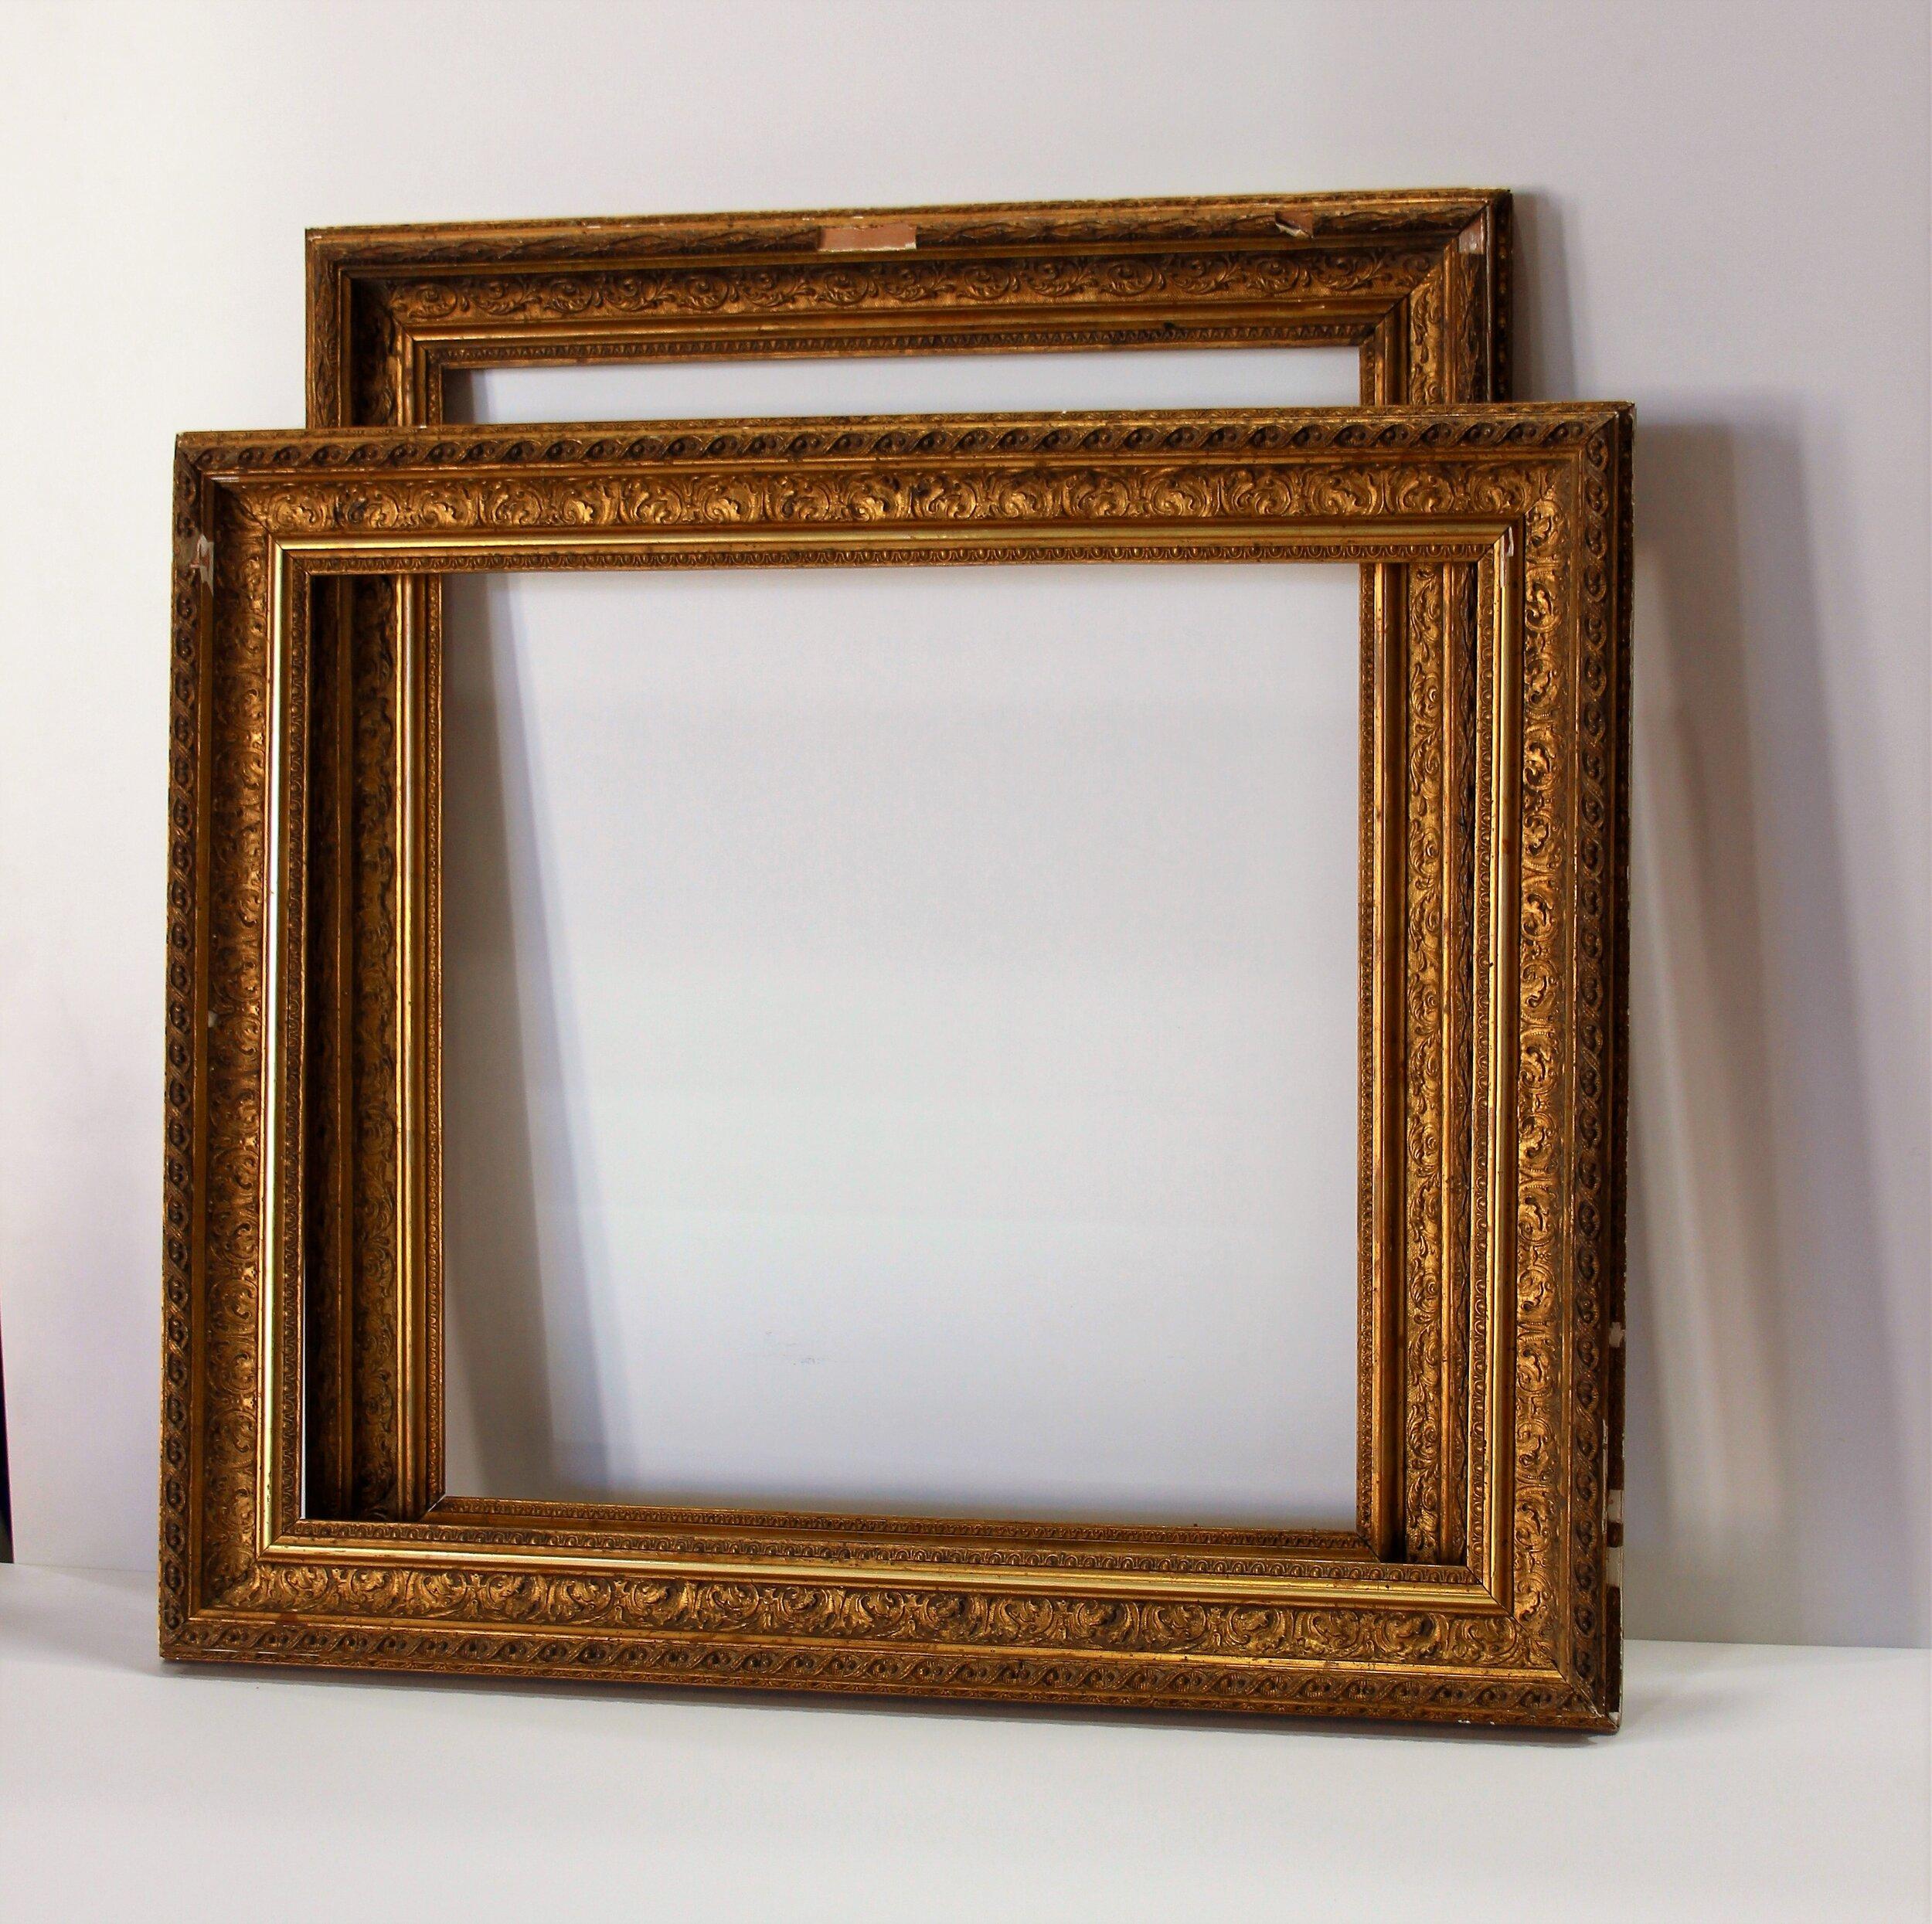 1890 S Ornate Victorian Gold Frames Ap00070 Custom Picture Framing Brisbane Artis Pura